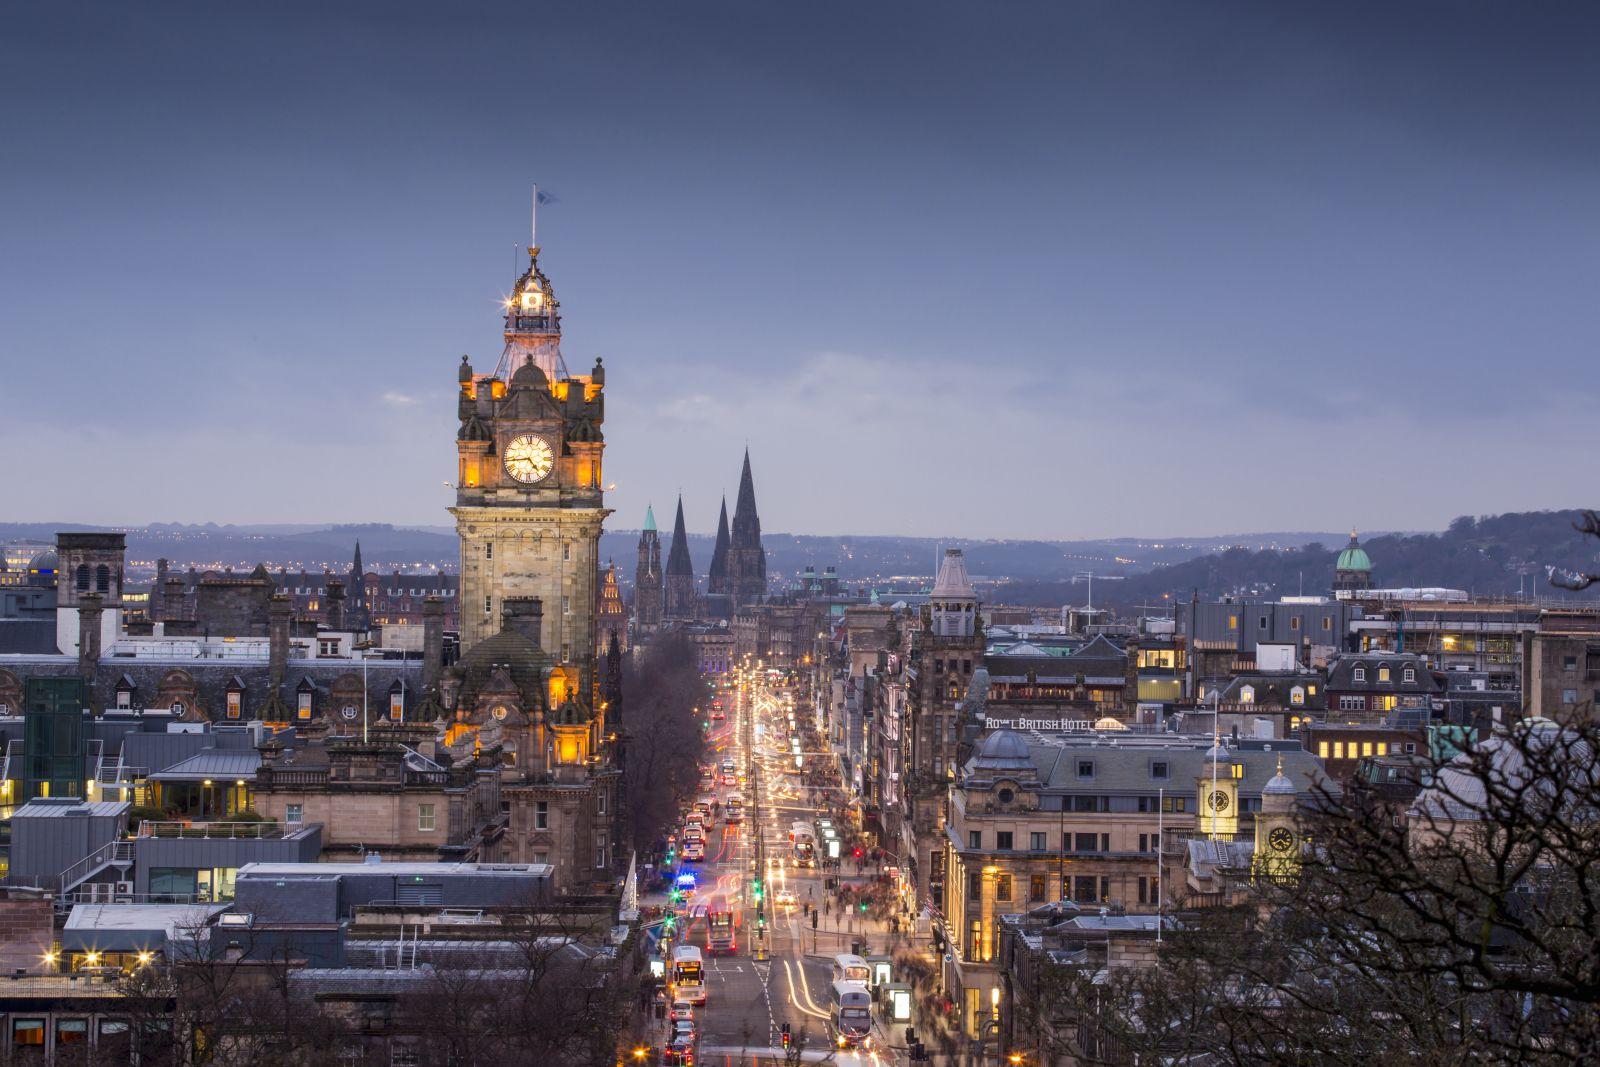 Edinburgh by night - Luxury Scottish Vacation